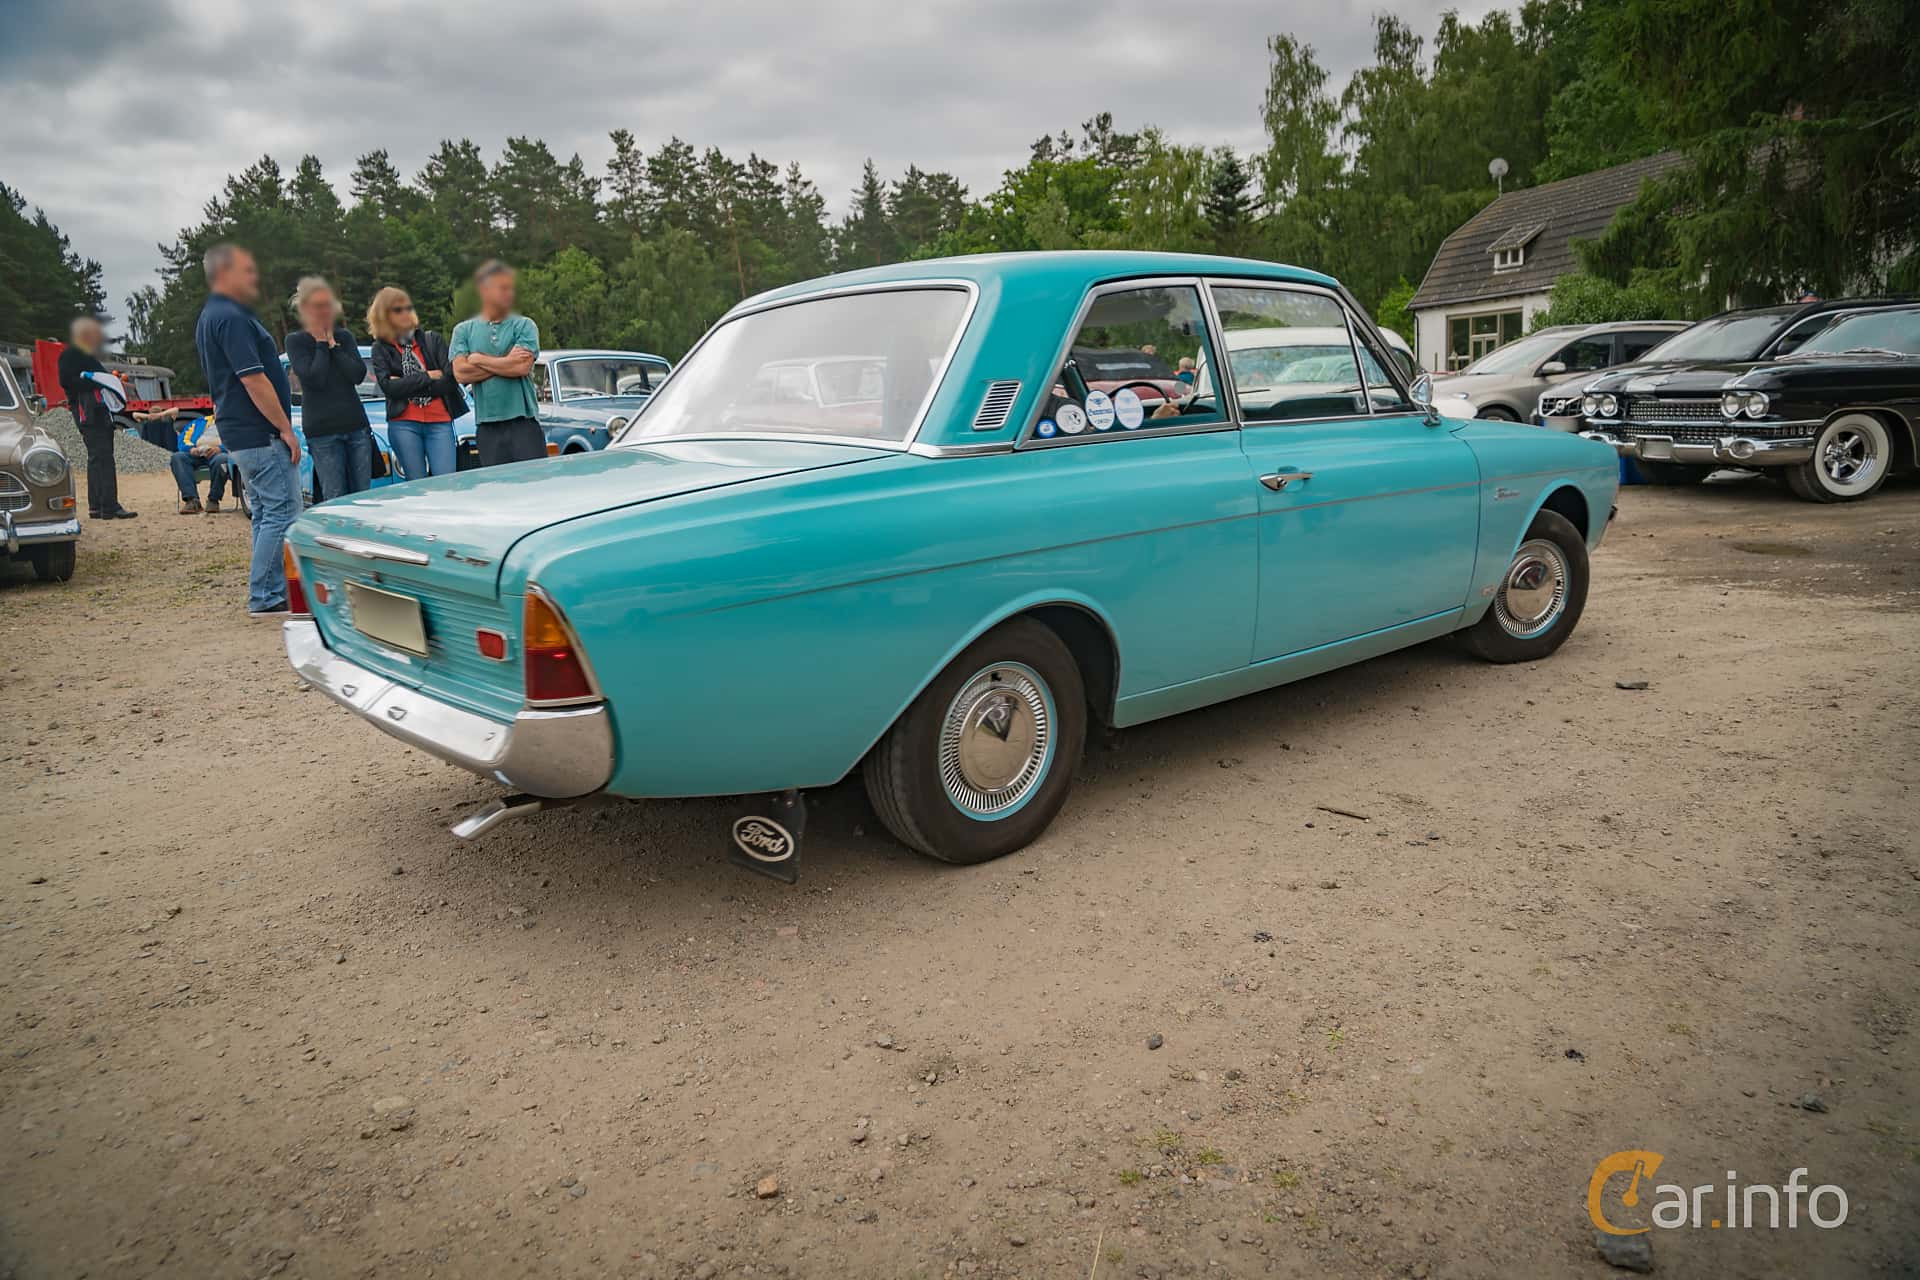 Ford Taunus 2-dörrar Limousine 1.7 Manuell, 71hk, 1965 at Ljuva 50-tal (2016 Version)